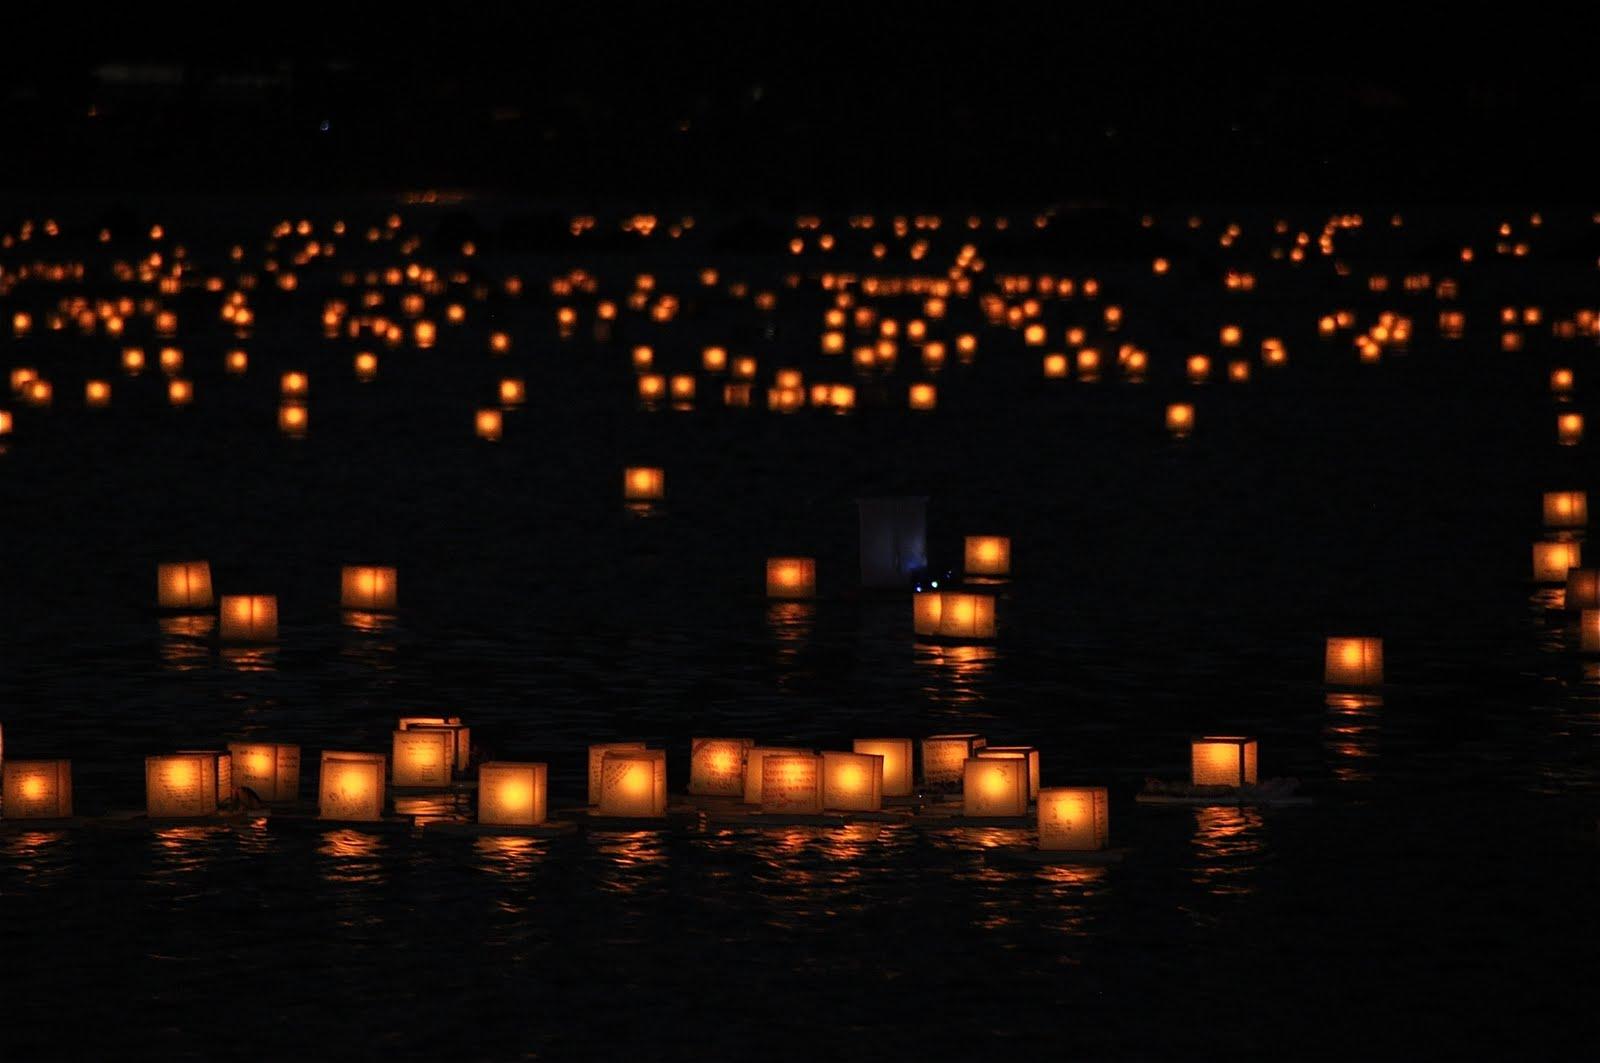 http://1.bp.blogspot.com/-Iey5U_CXS-A/UQNqoAYecBI/AAAAAAAAPSg/7uYCwhBc3BQ/s1600/Floating+Lanterns,+Honolulu,+Hawaii+13.jpg